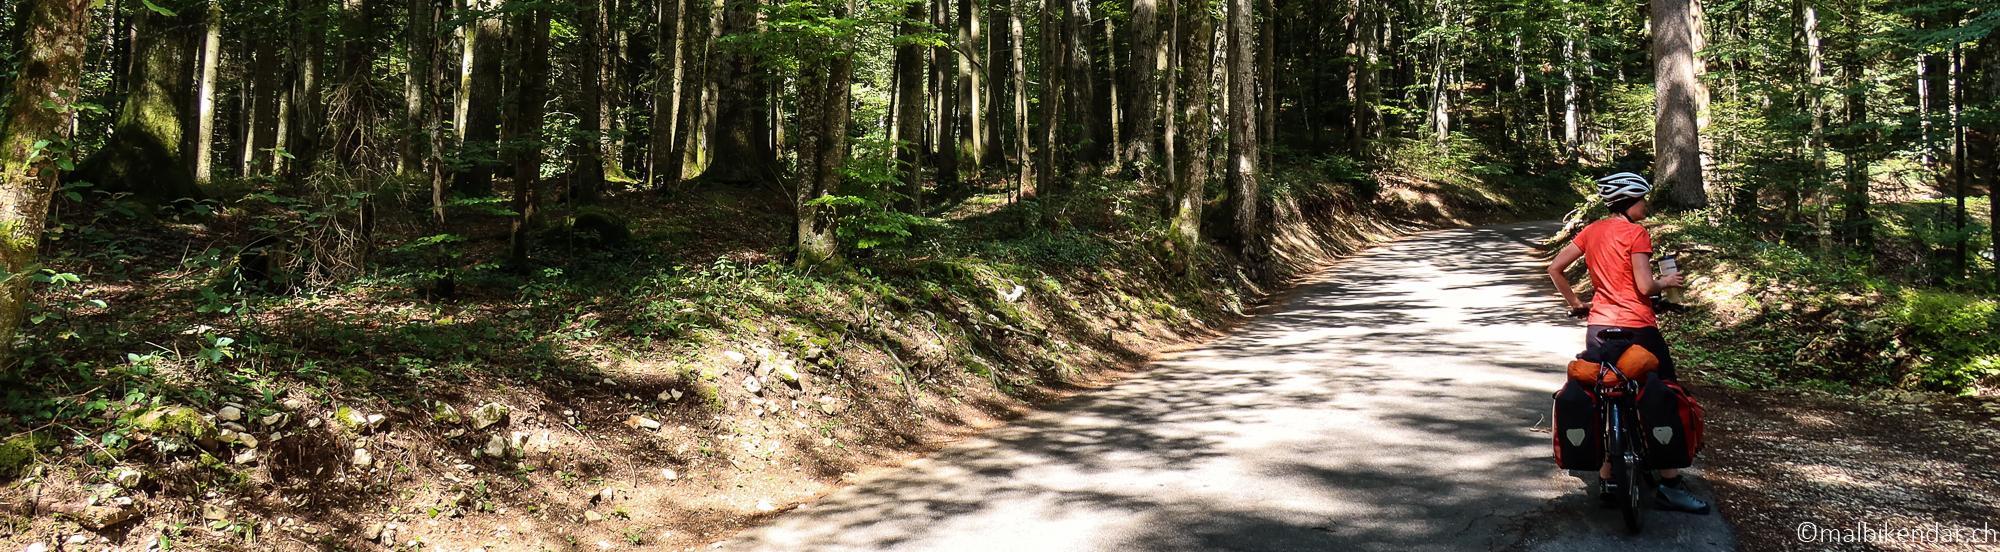 Jura à vélo - la montée vers Rothel